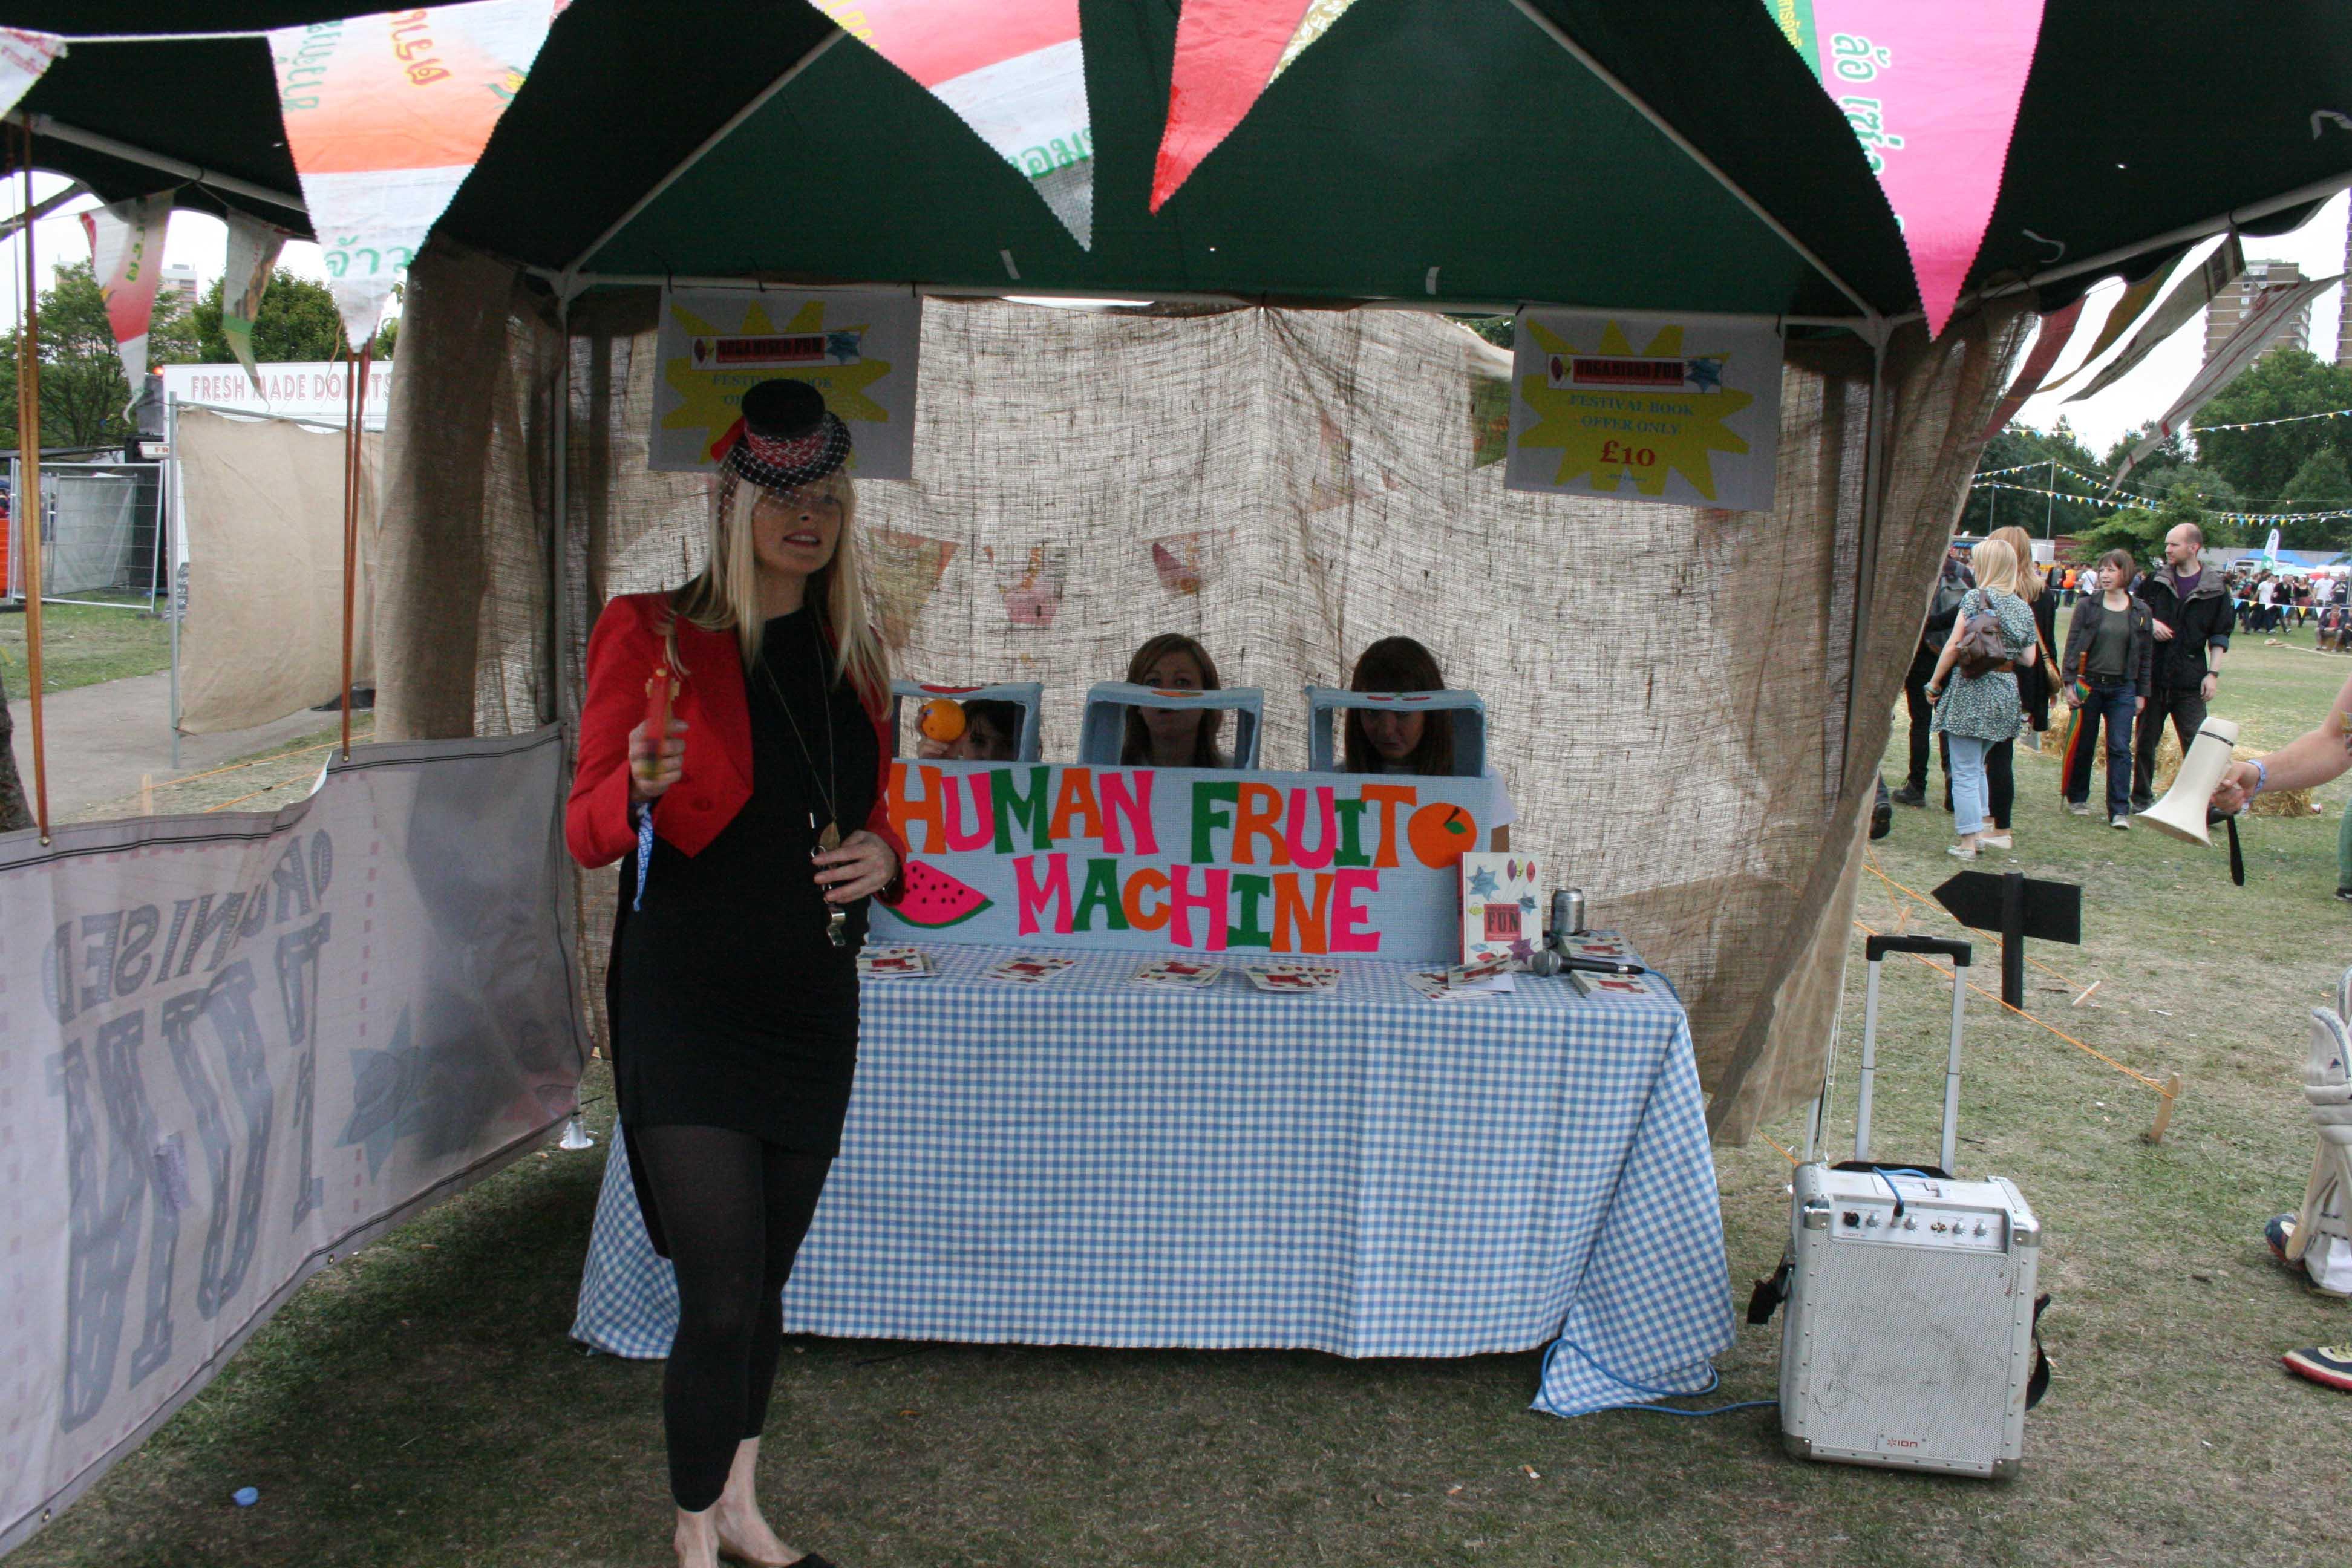 London fair (London)